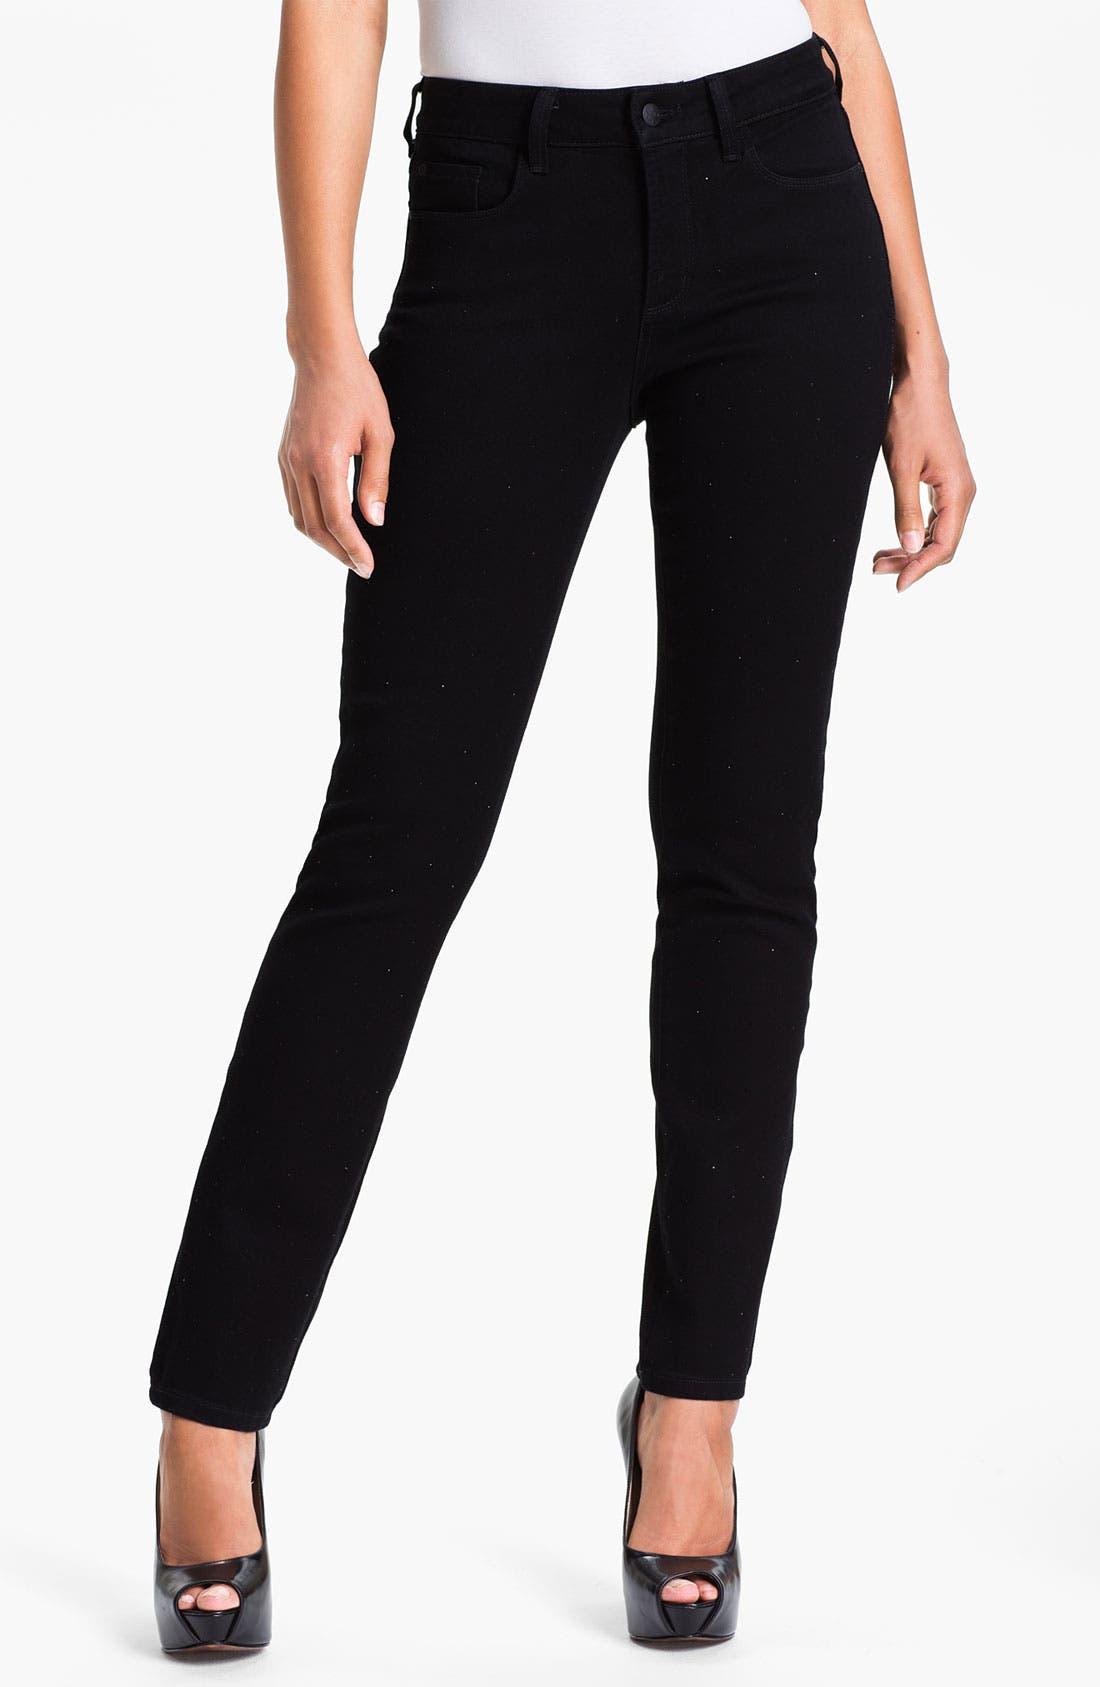 Main Image - NYDJ 'Sheri' Sparkle Skinny Stretch Jeans